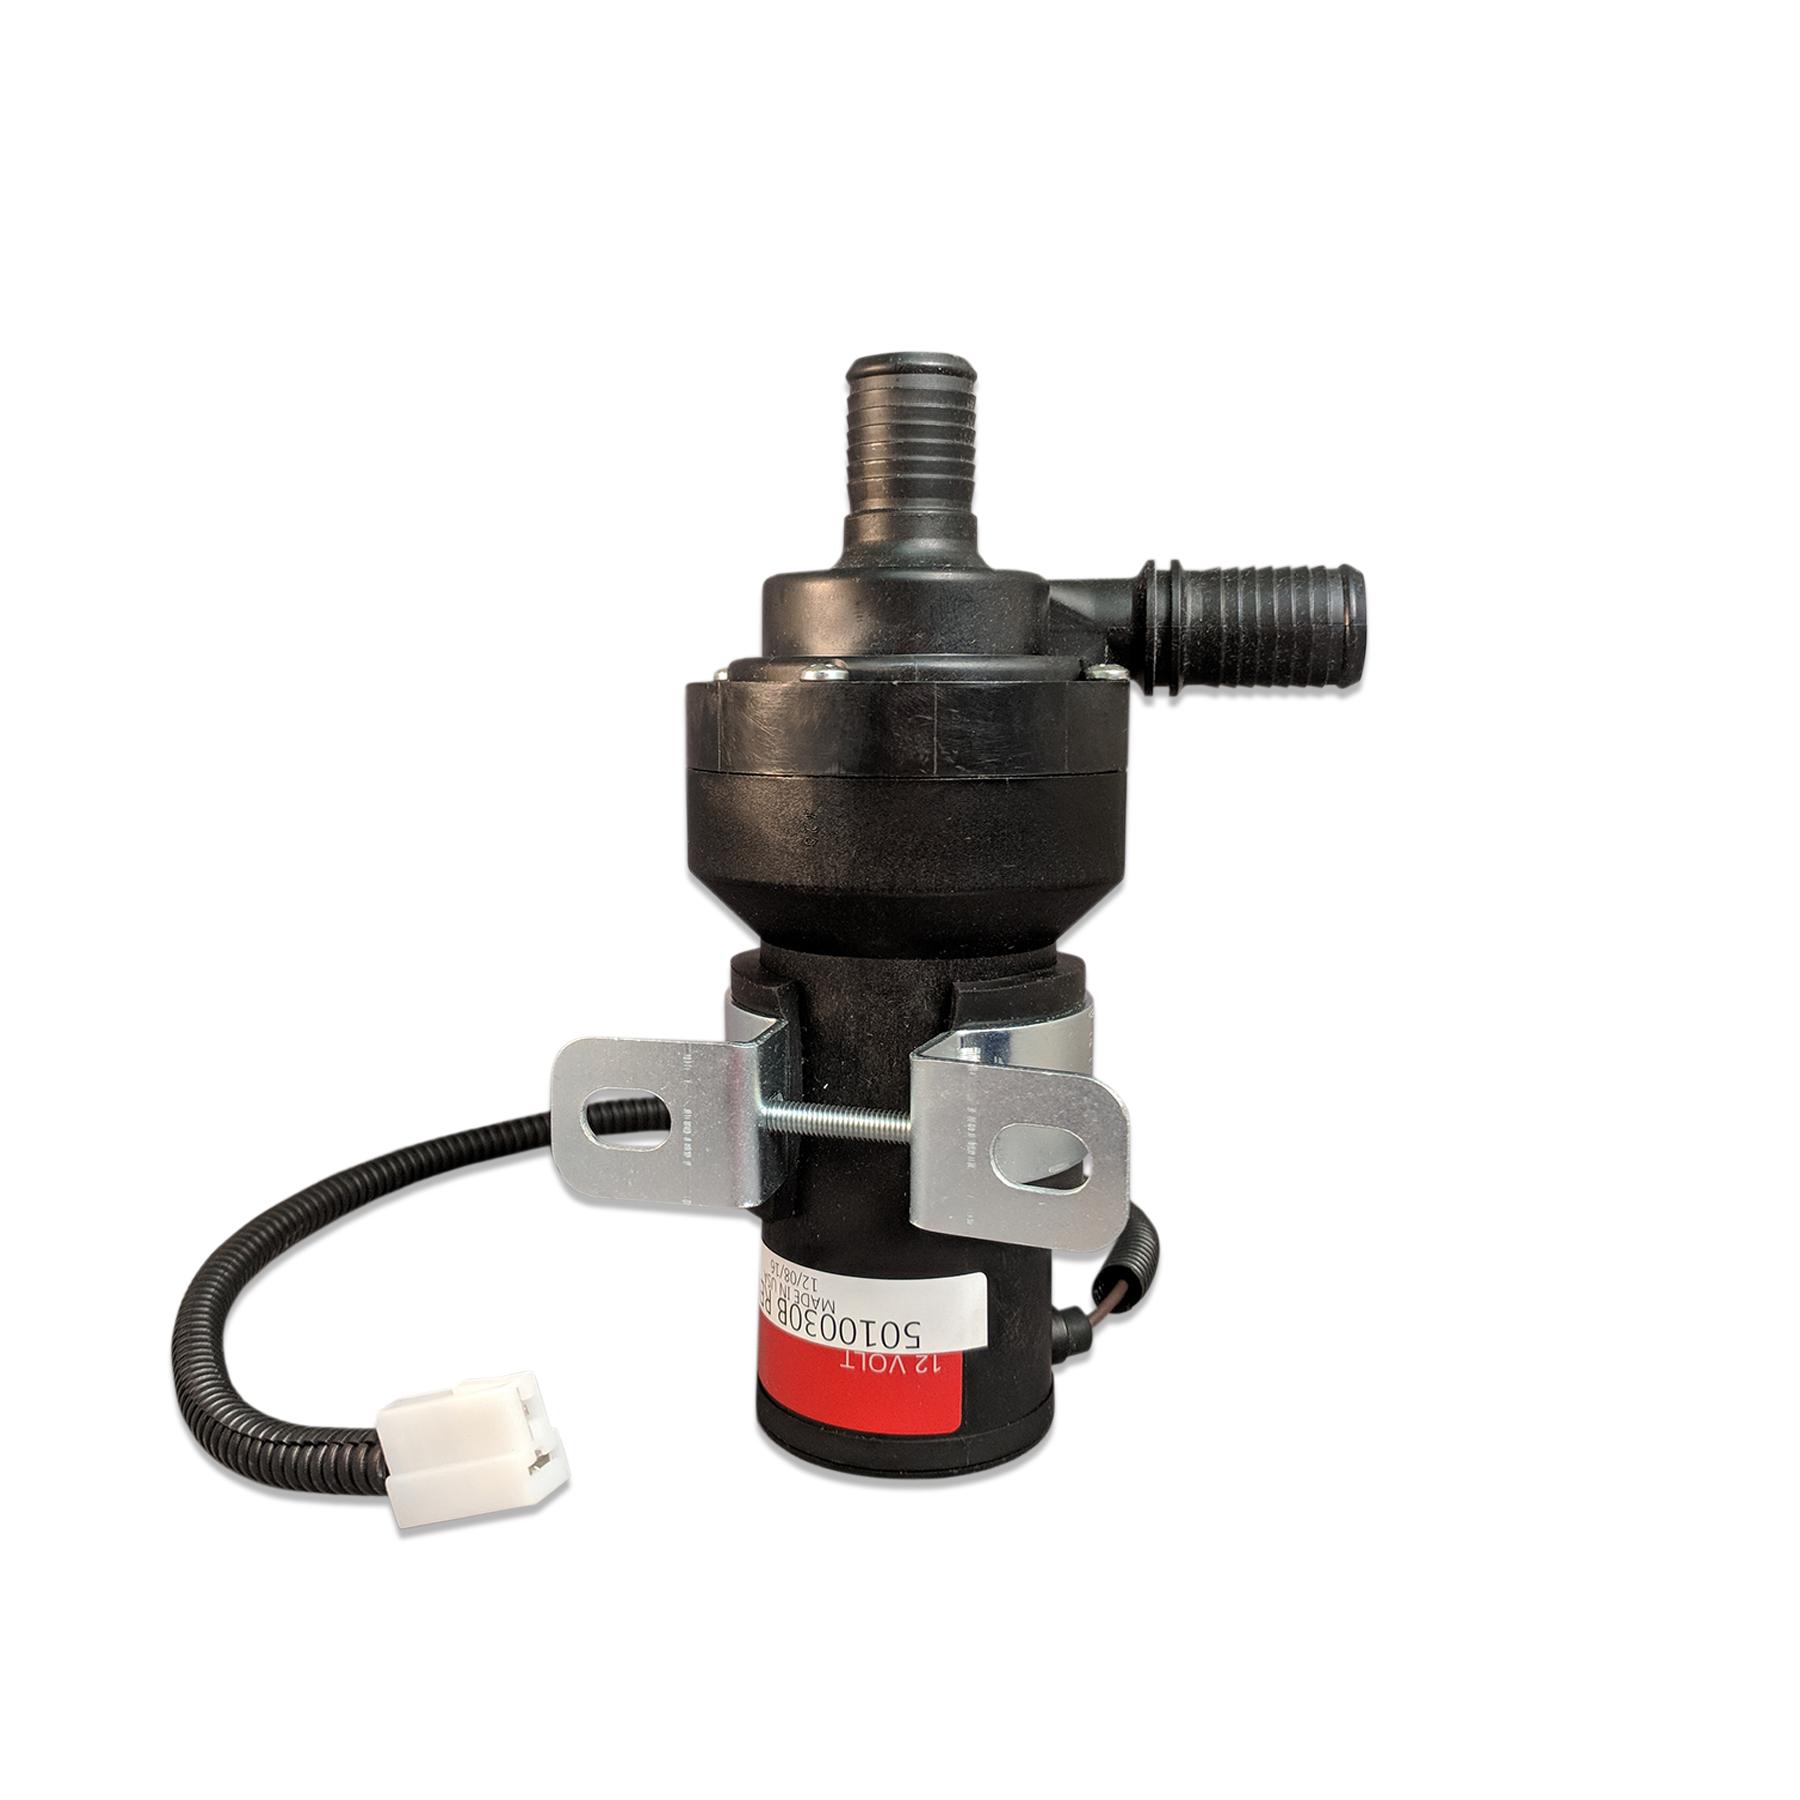 12 VDC U4810 Circulation Pump w/Mounting Bracket, TH-90